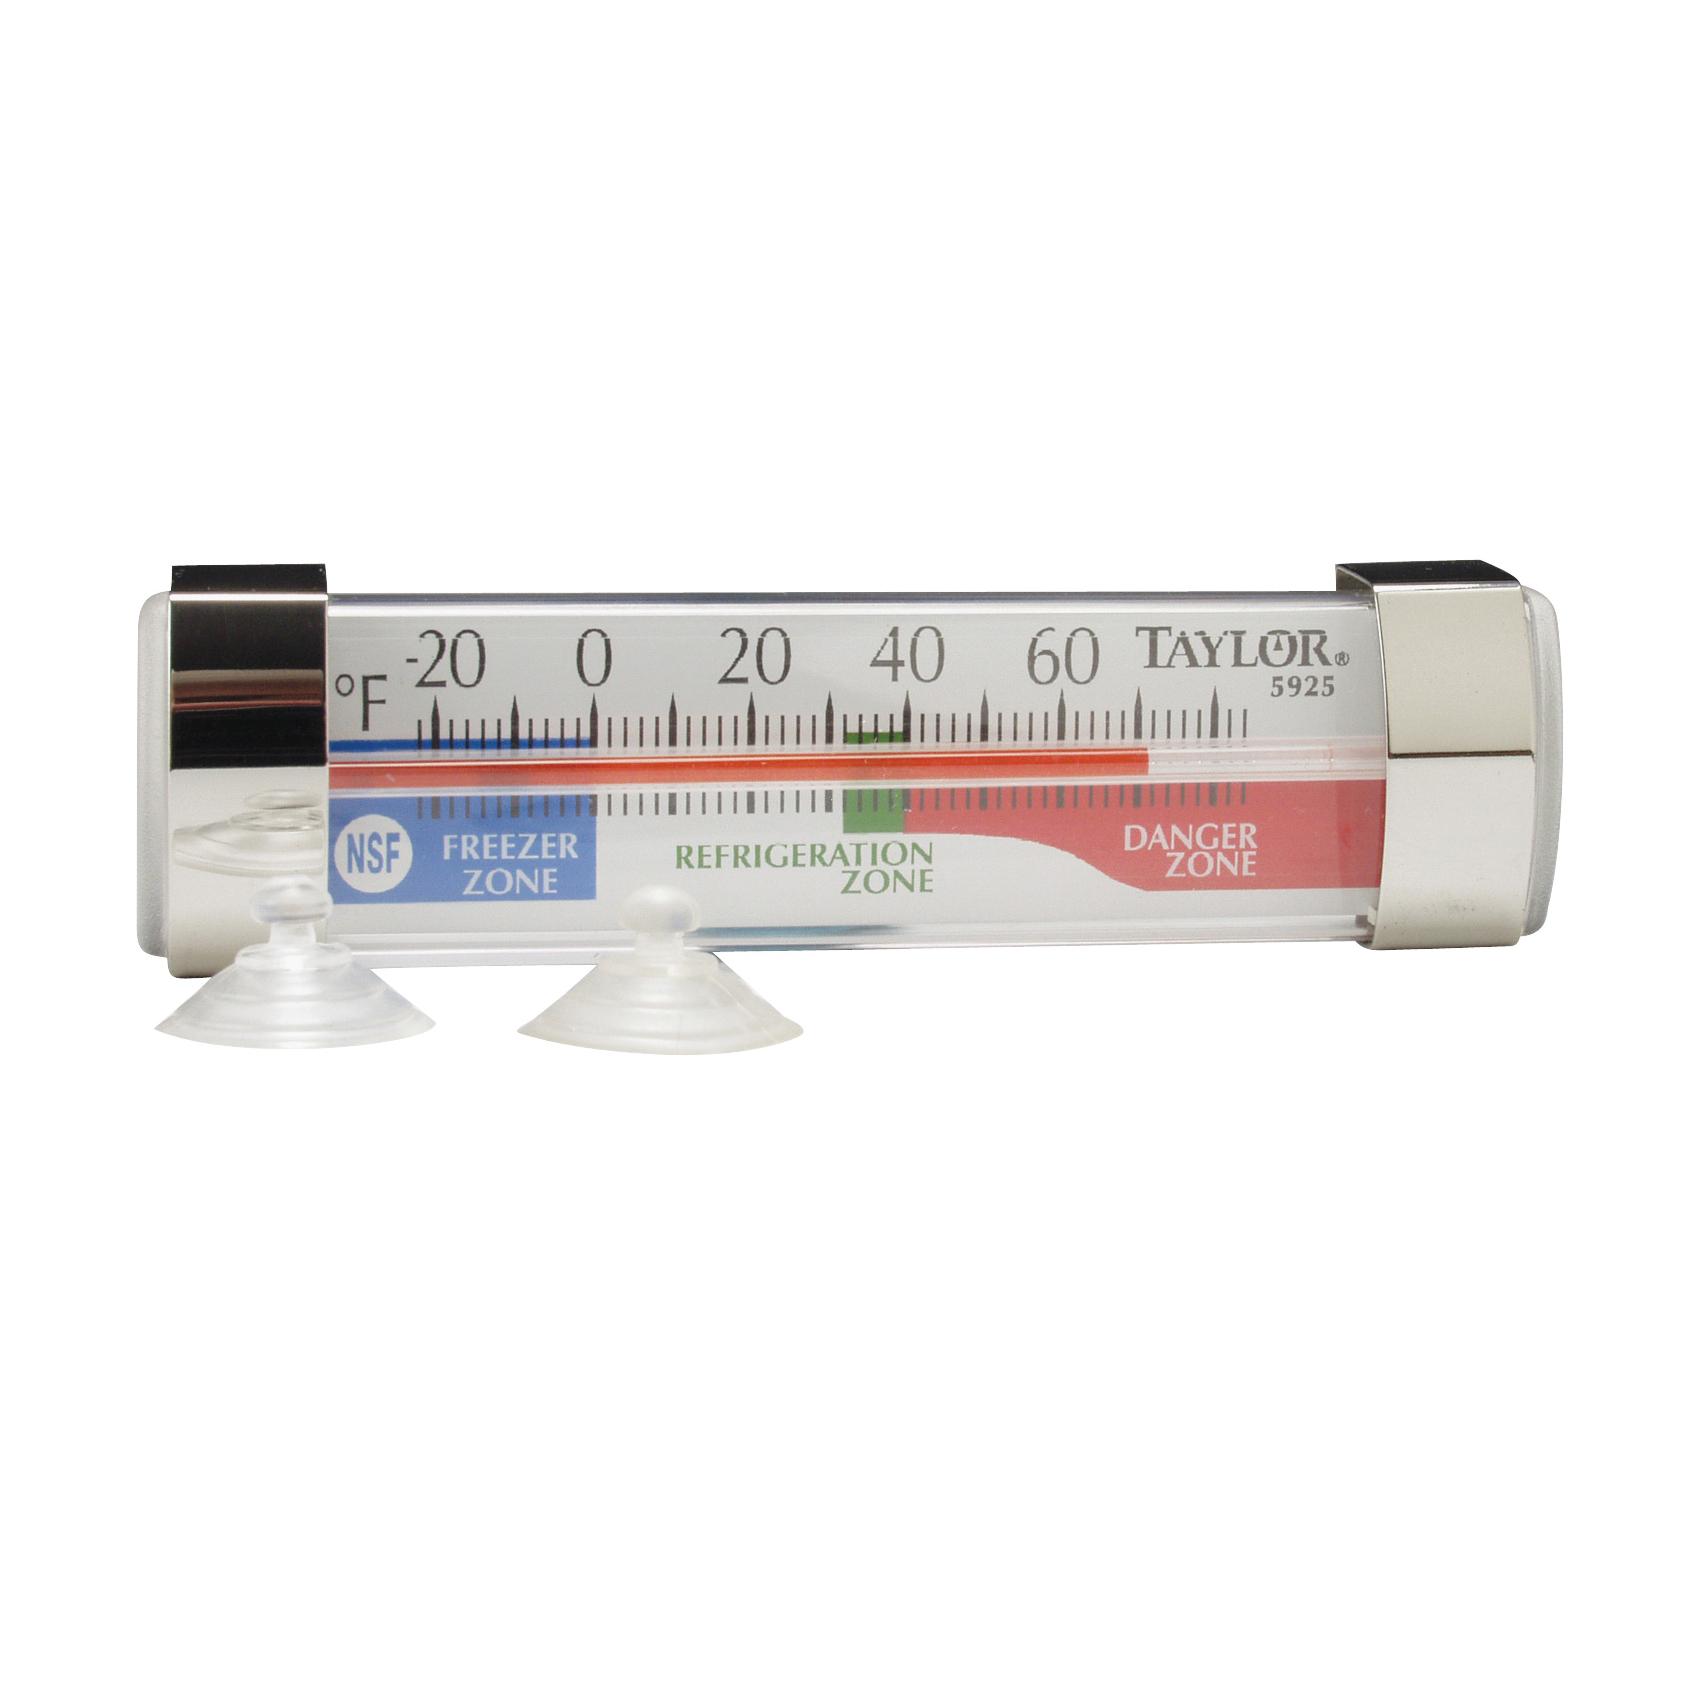 Picture of Taylor 5925N Fridge/Freezer Thermometer, -20 to 80 deg F, Analog Display, White